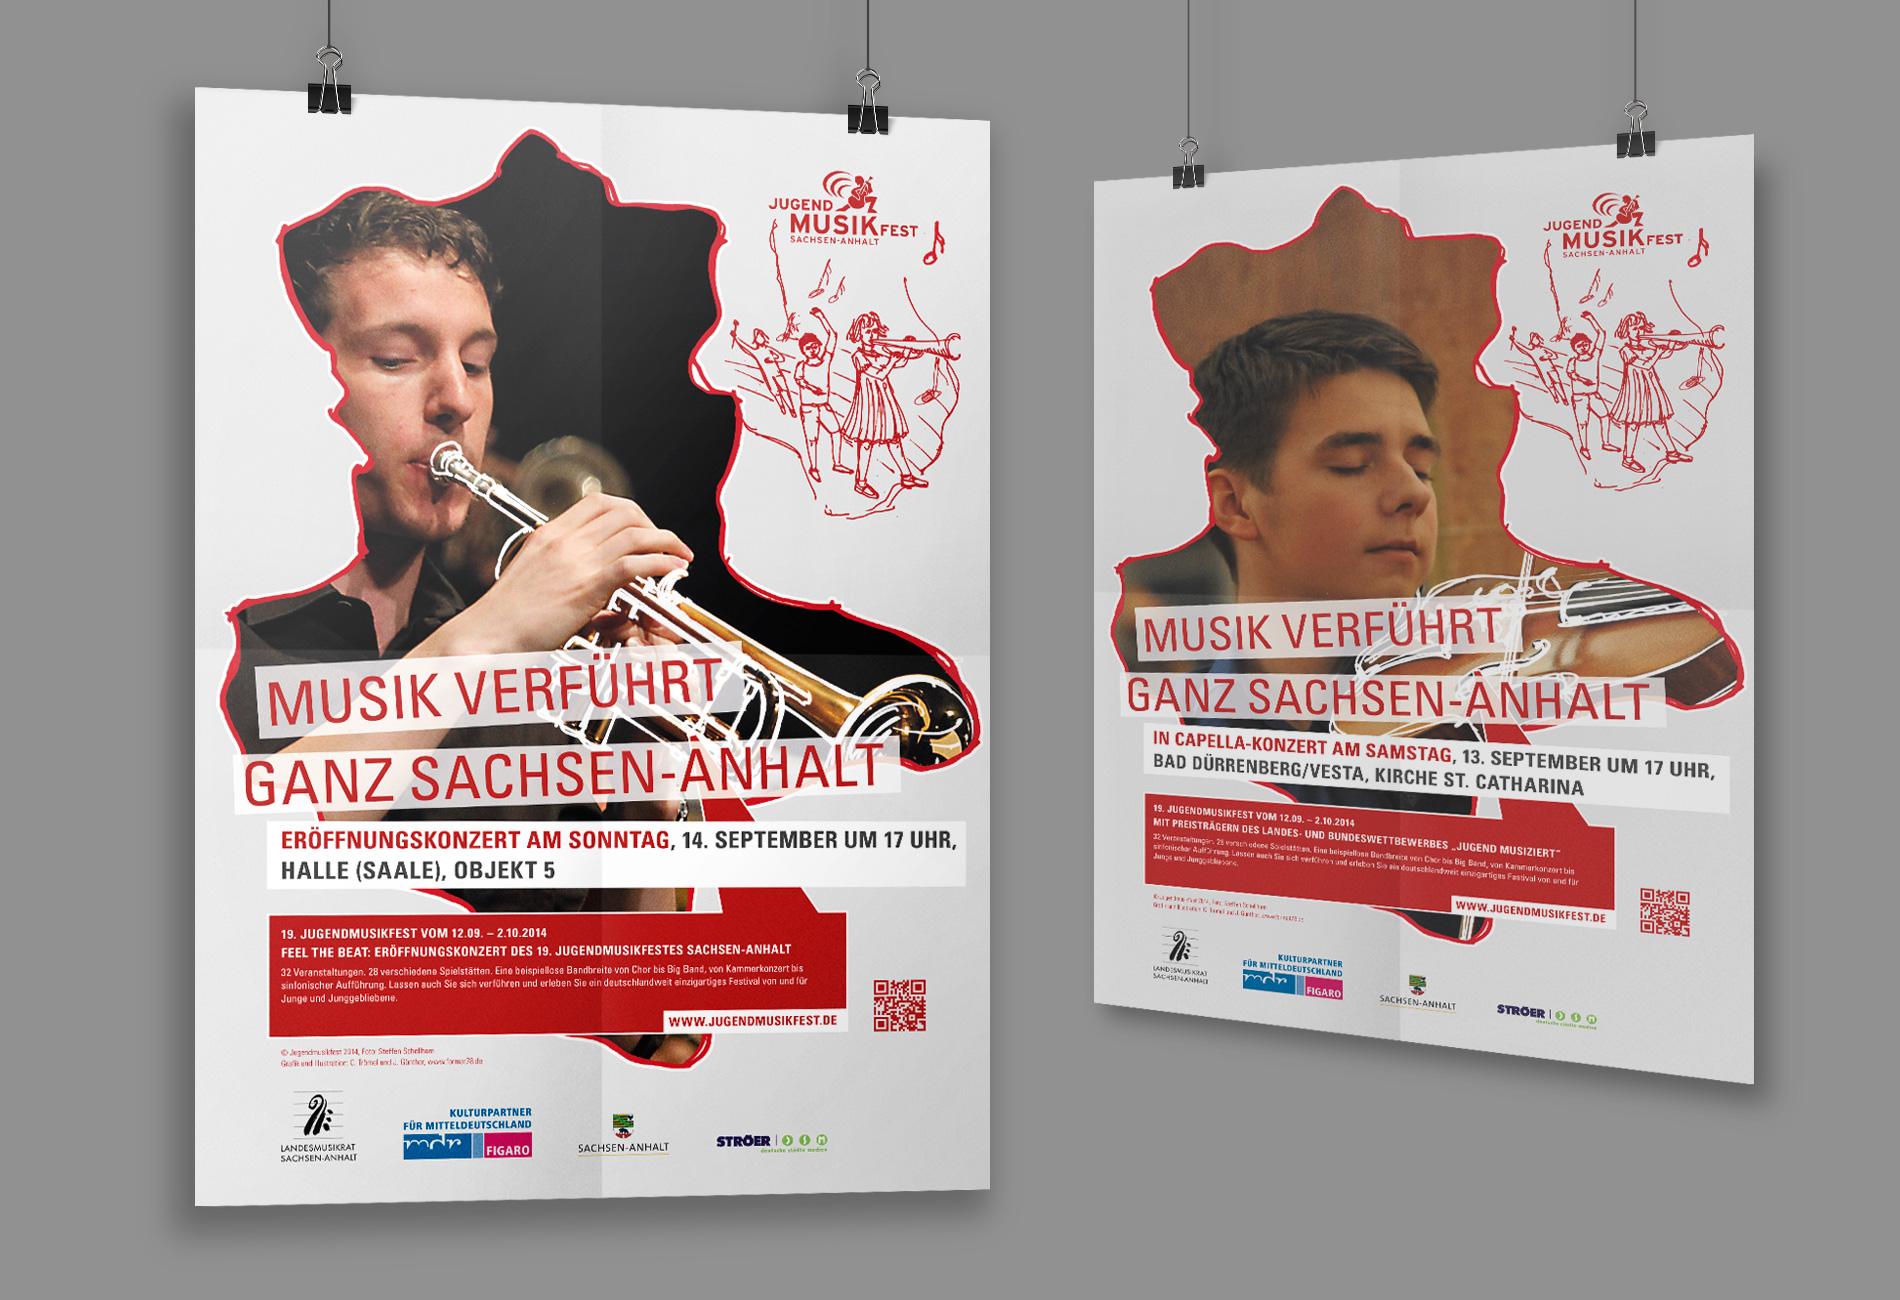 Landesmusikrat Sachsen-Anhalt e. V.